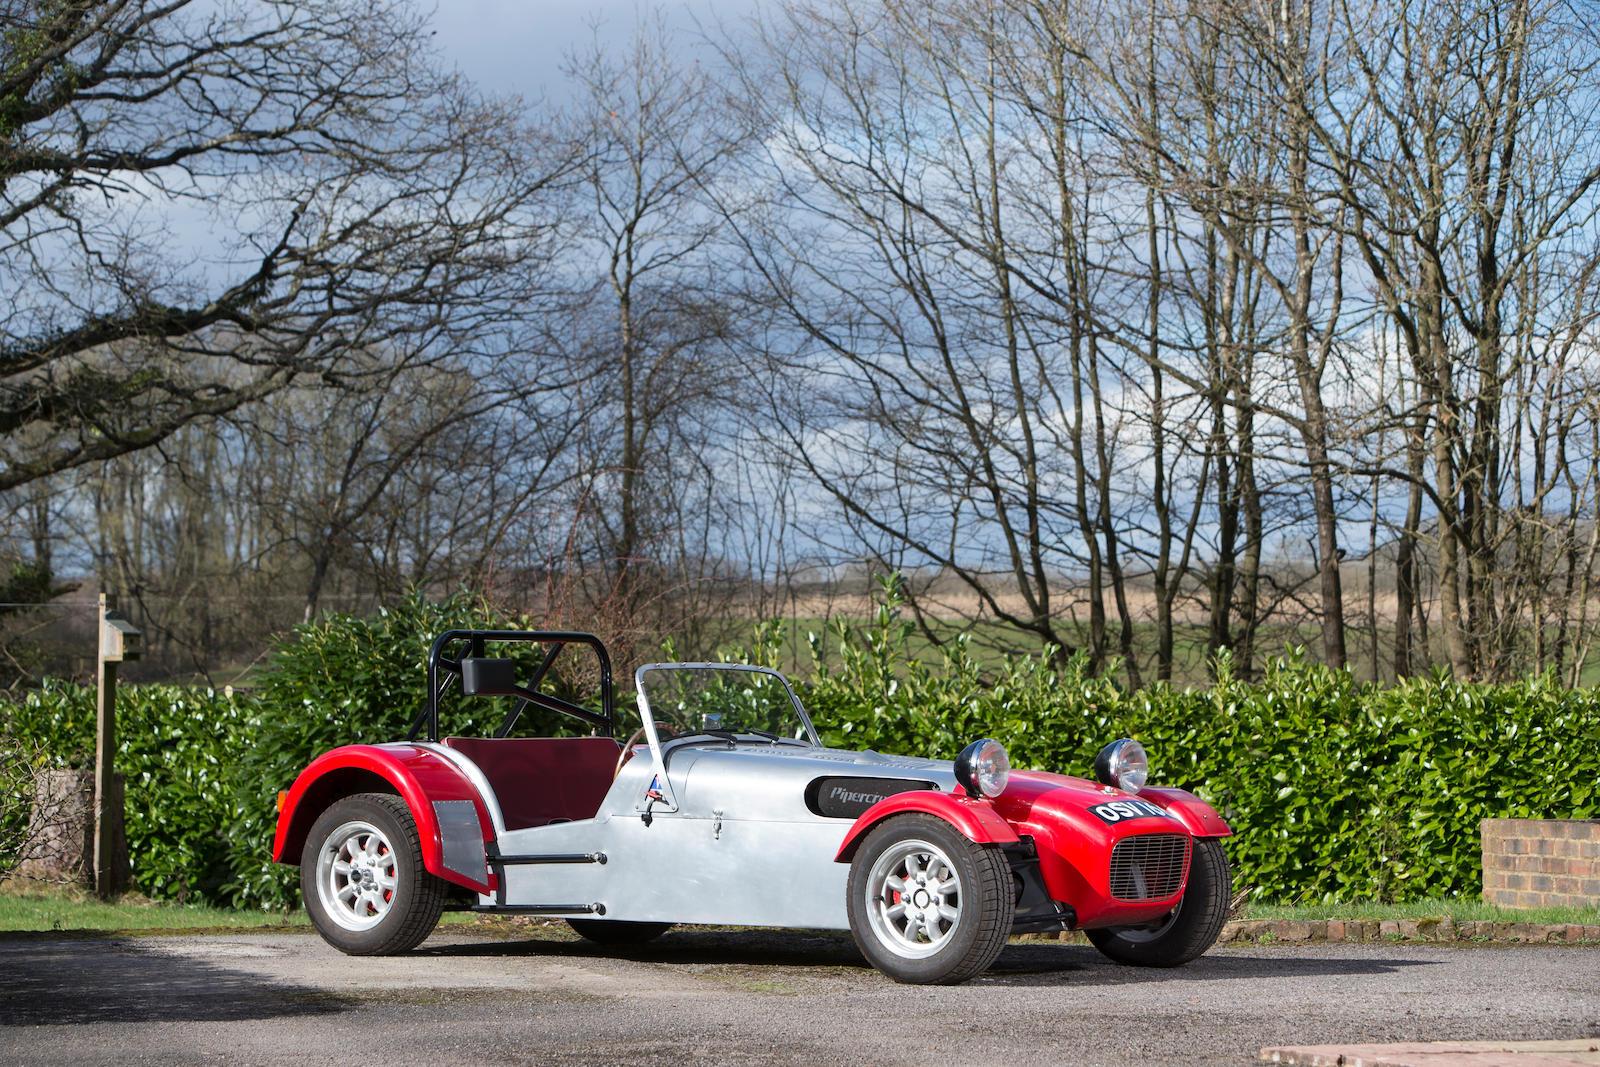 1959 Lotus Seven roadster